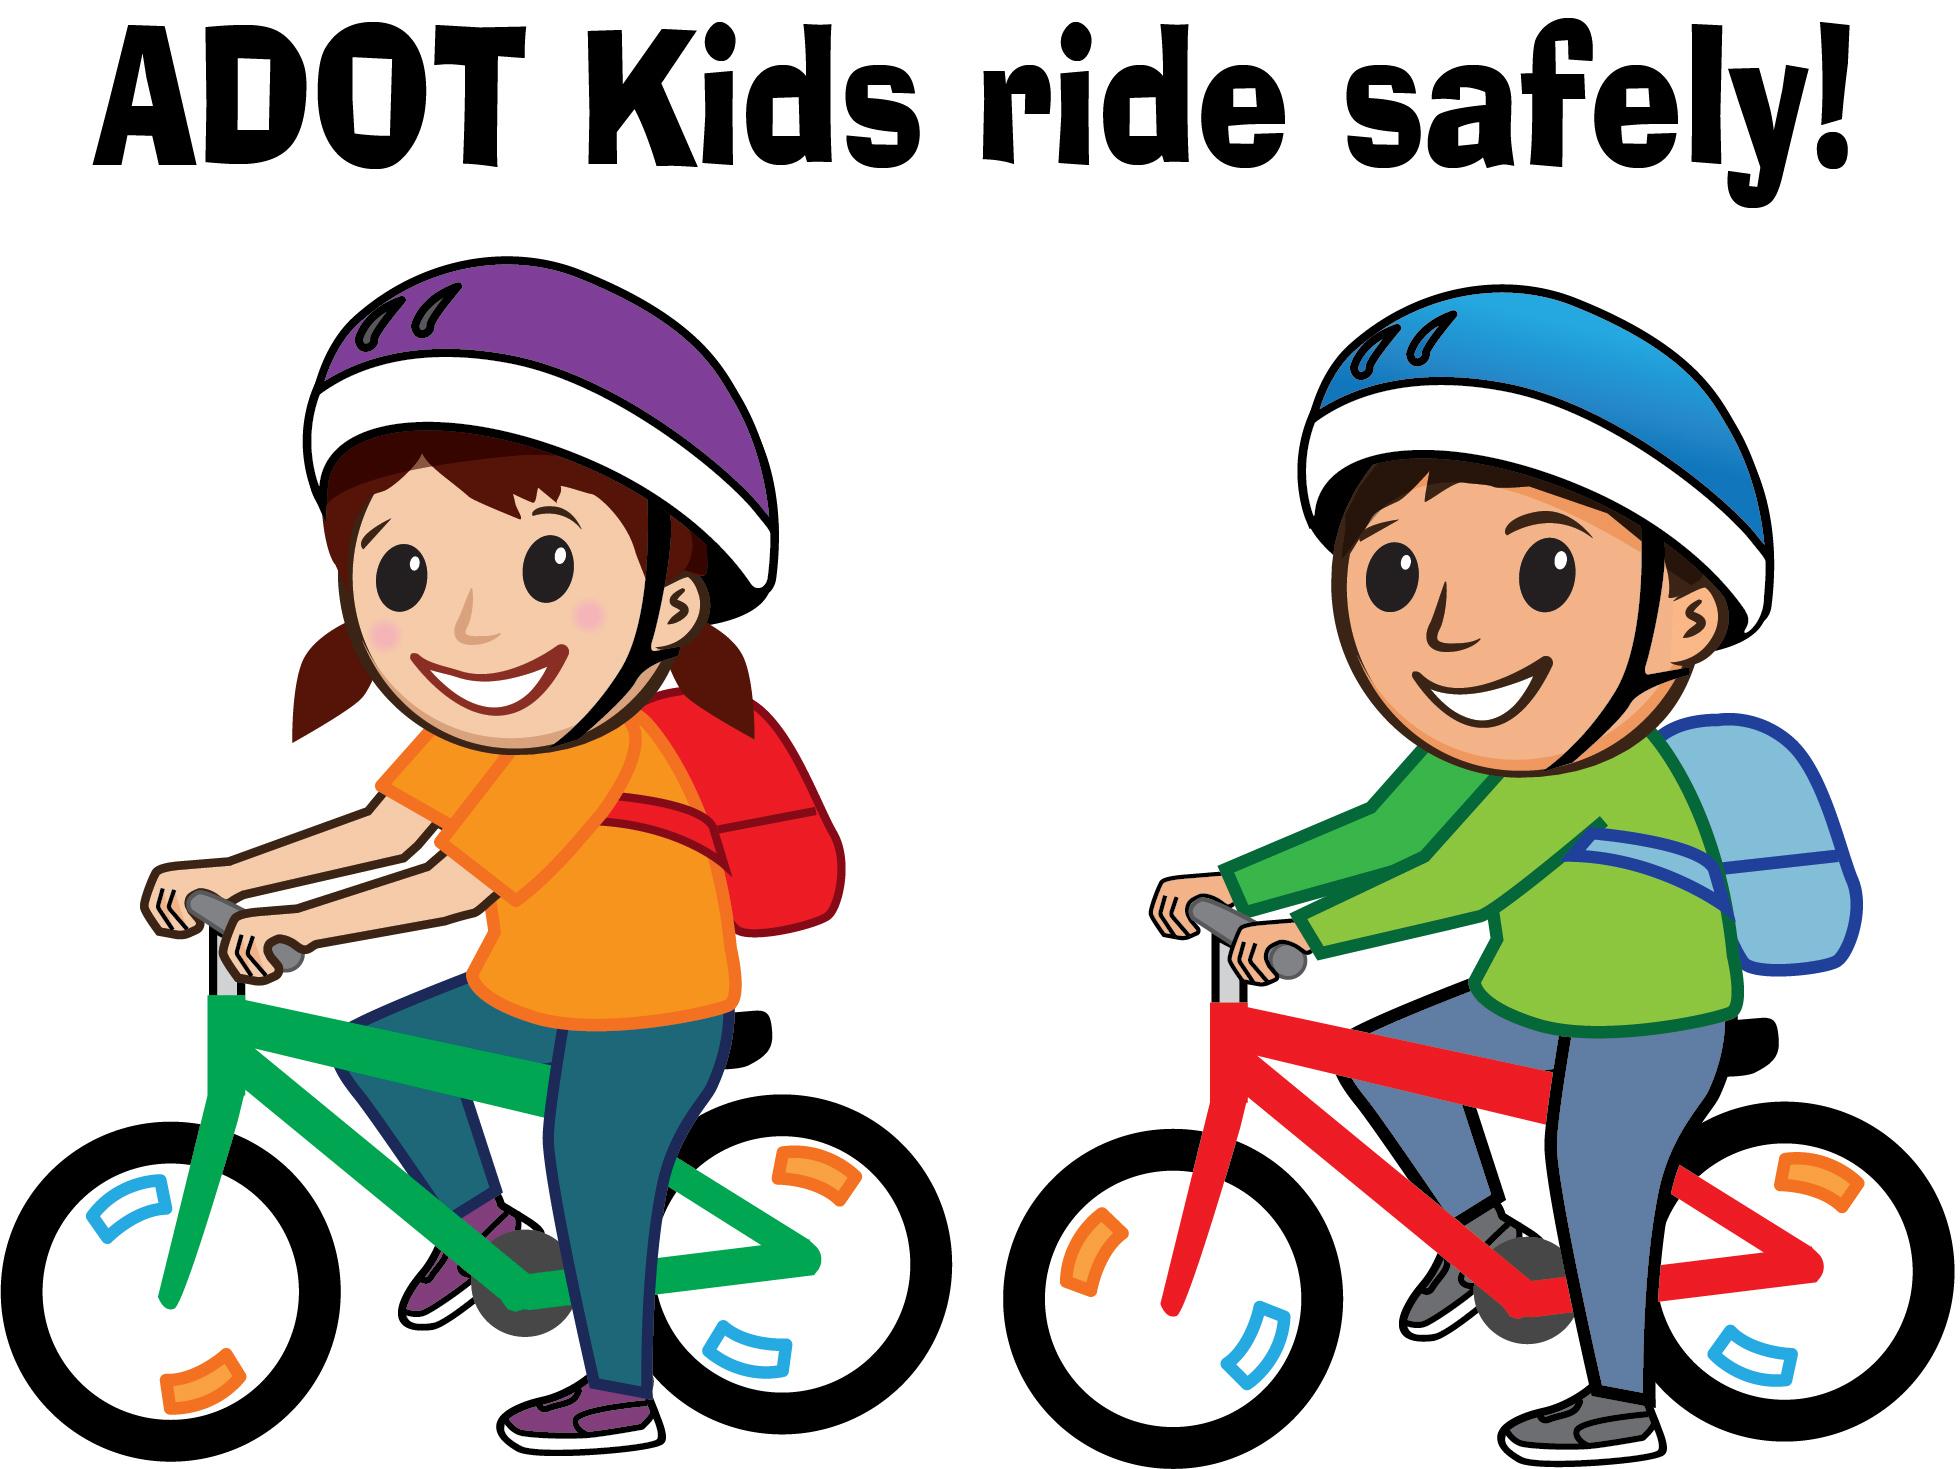 ADOTKids bicycle safety